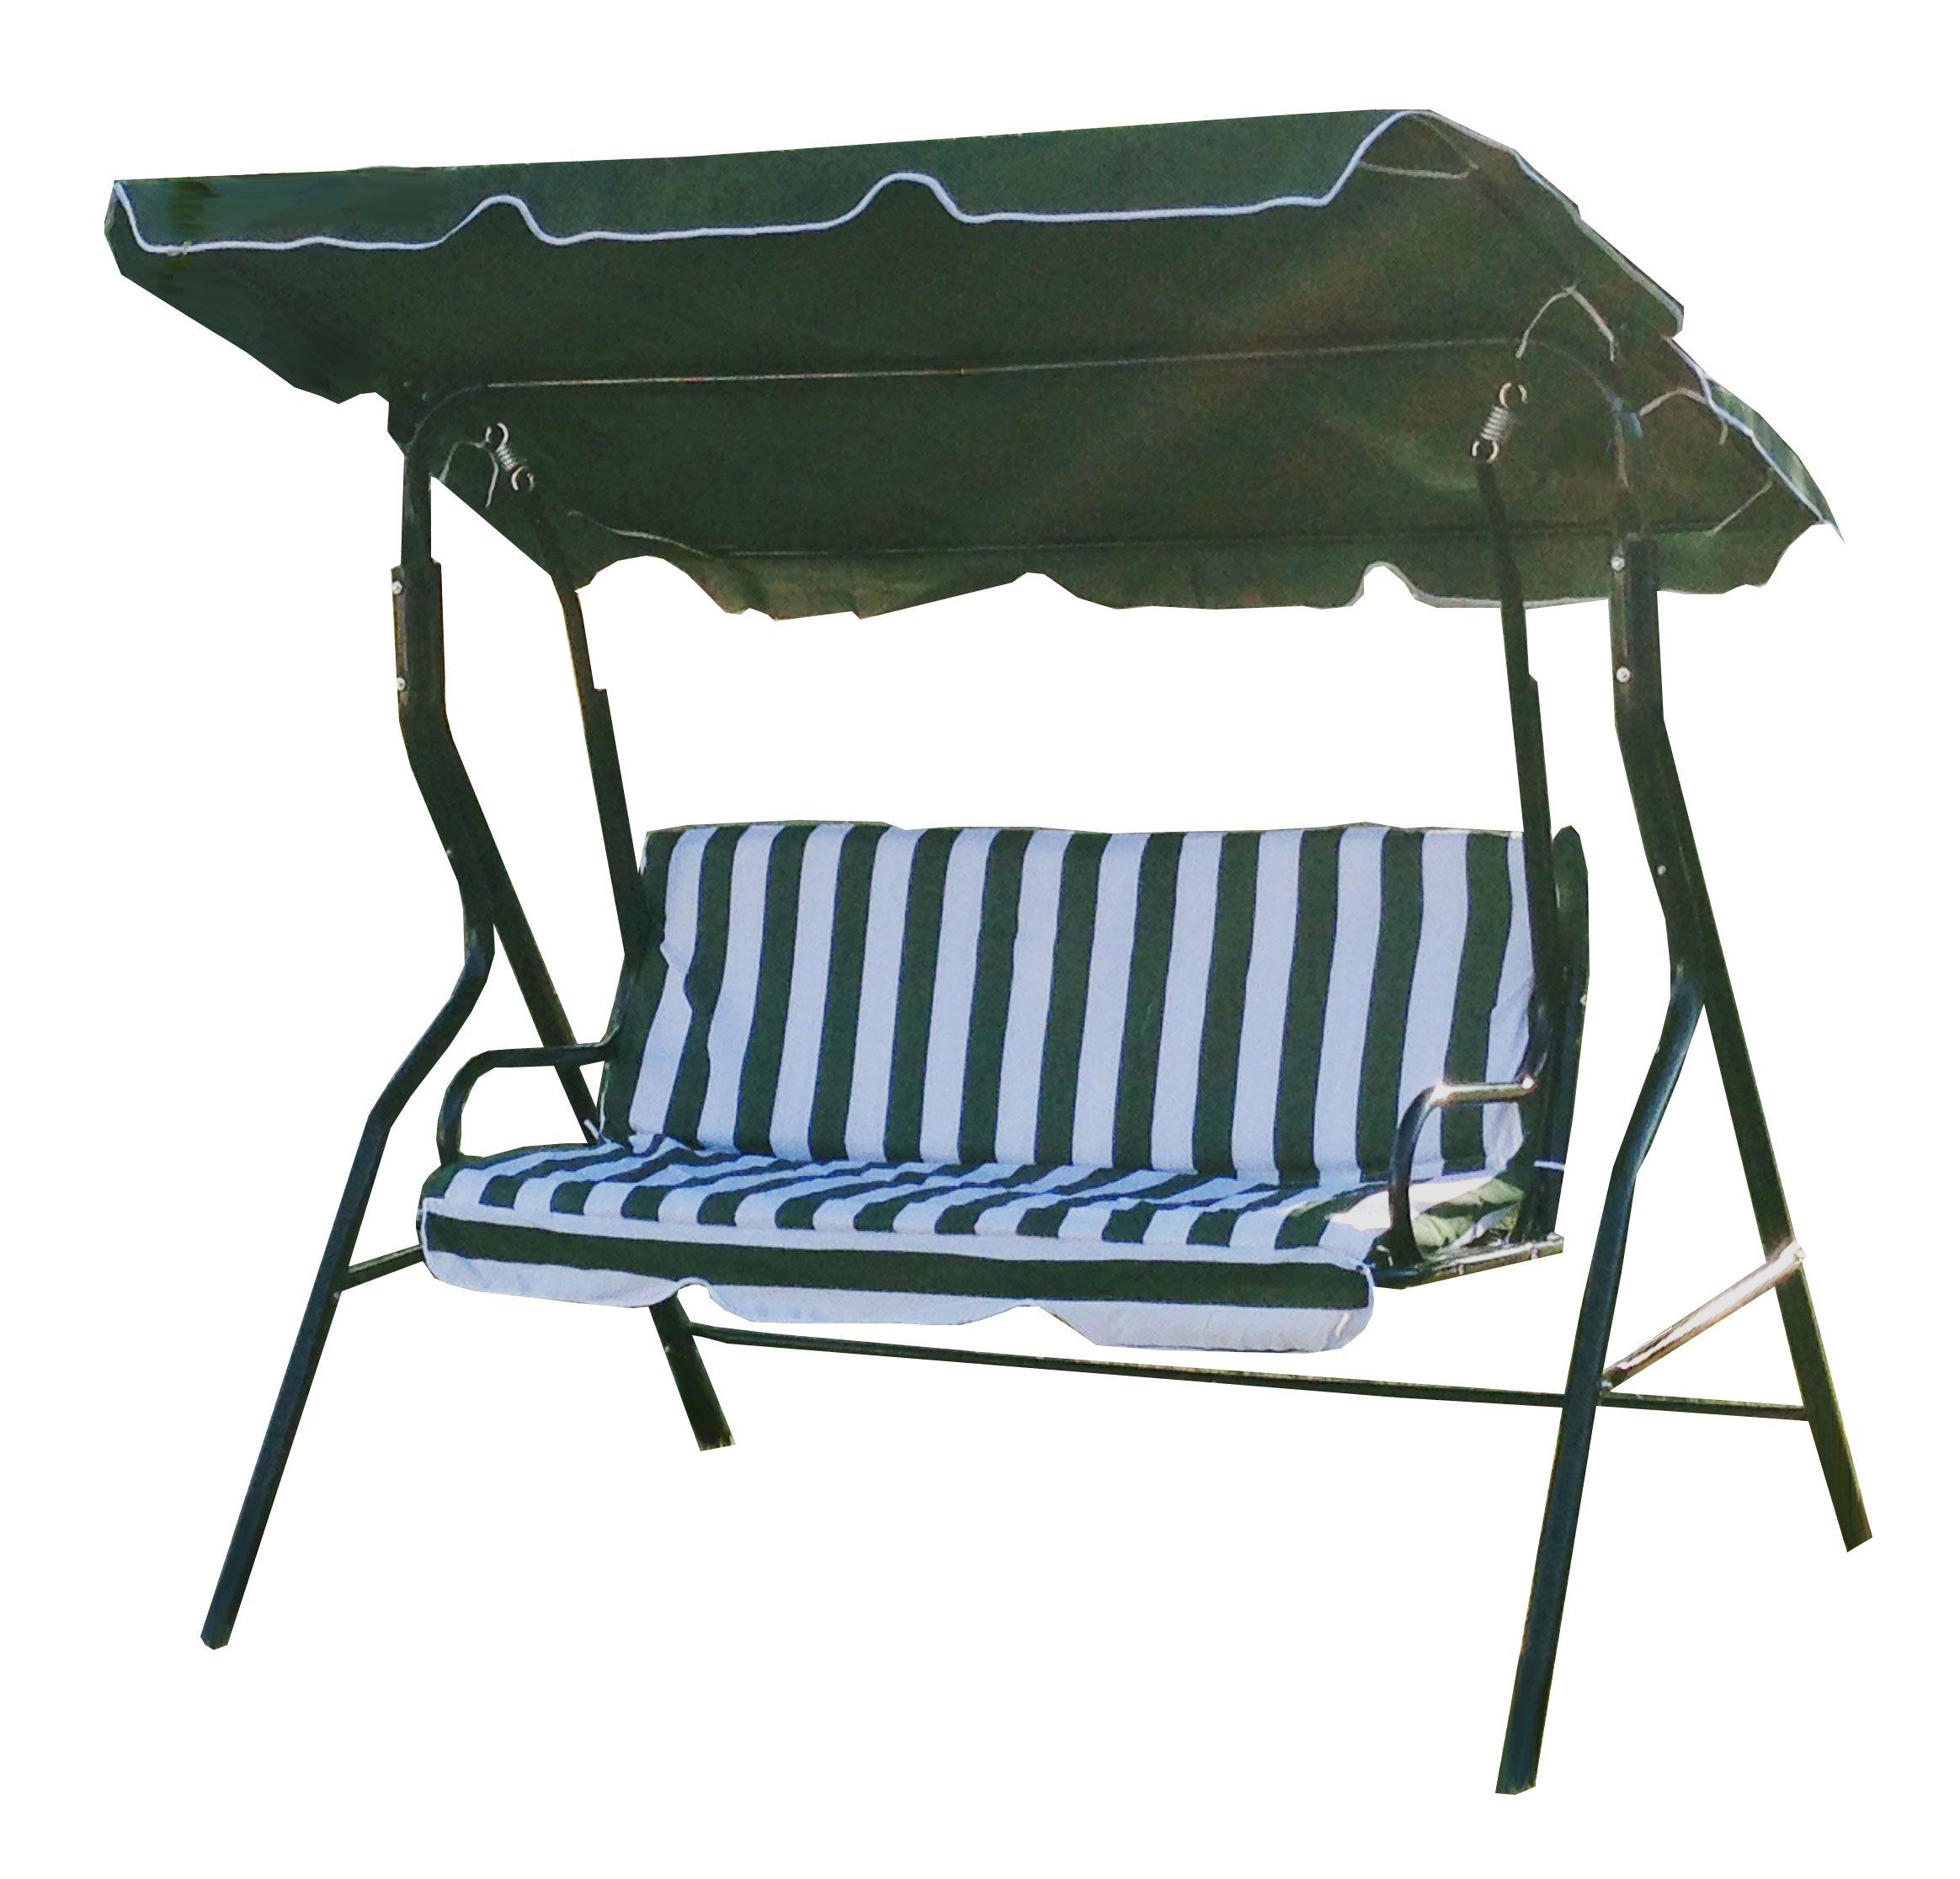 swing chair garden b&m rocking kits for sale new swinging hammock outdoor bench